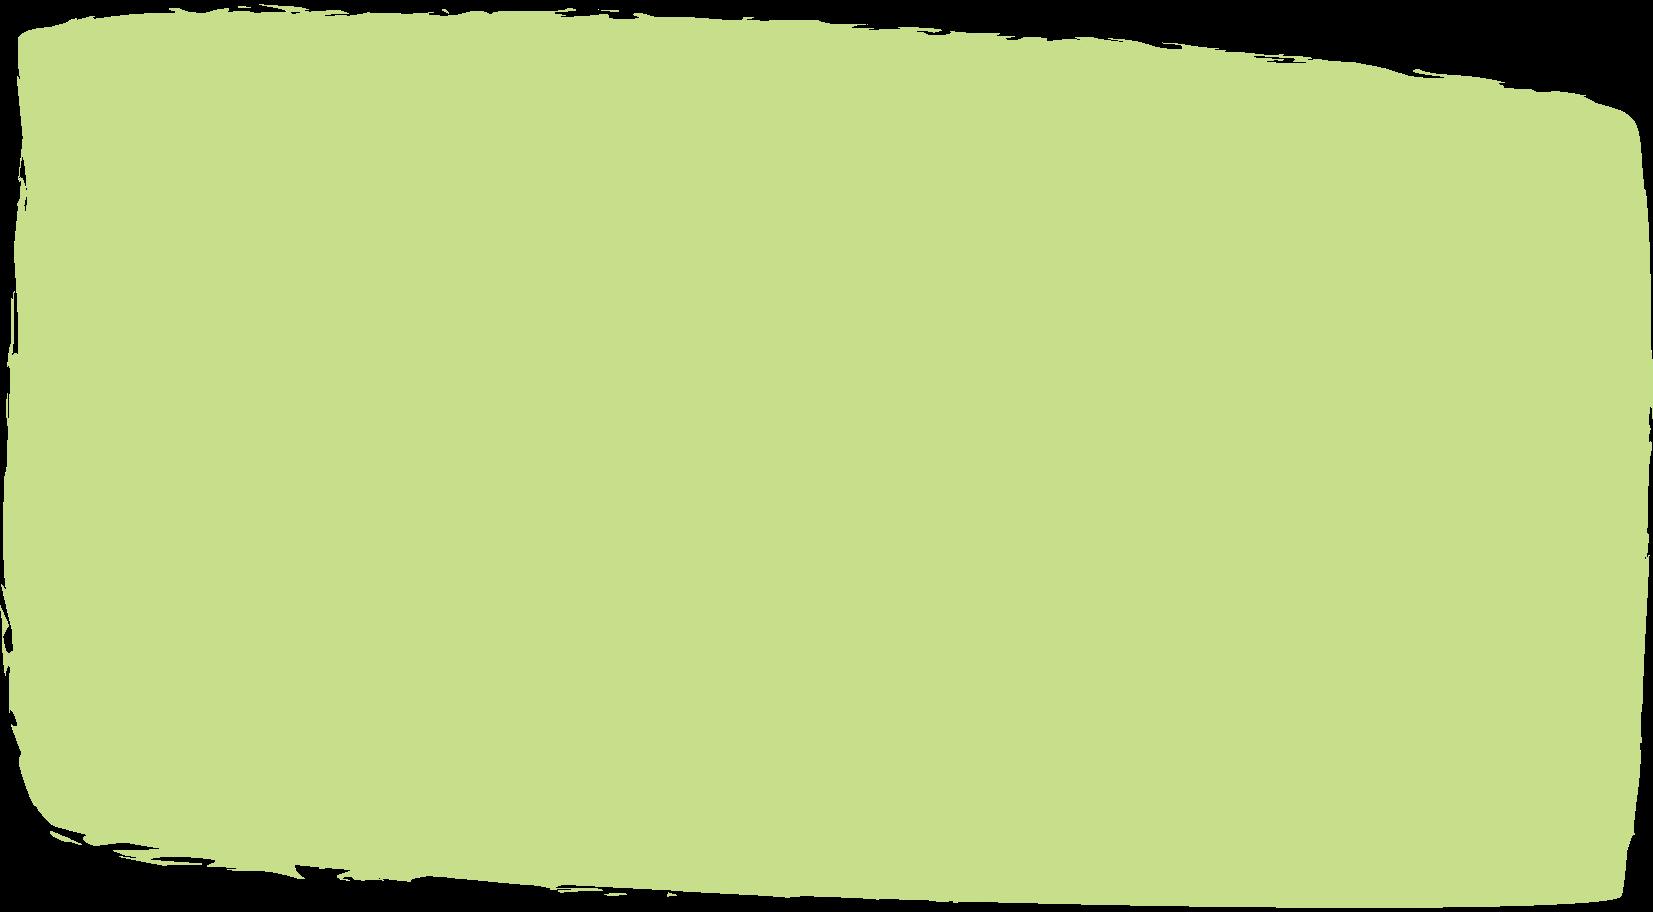 rectangle-light-green Clipart illustration in PNG, SVG